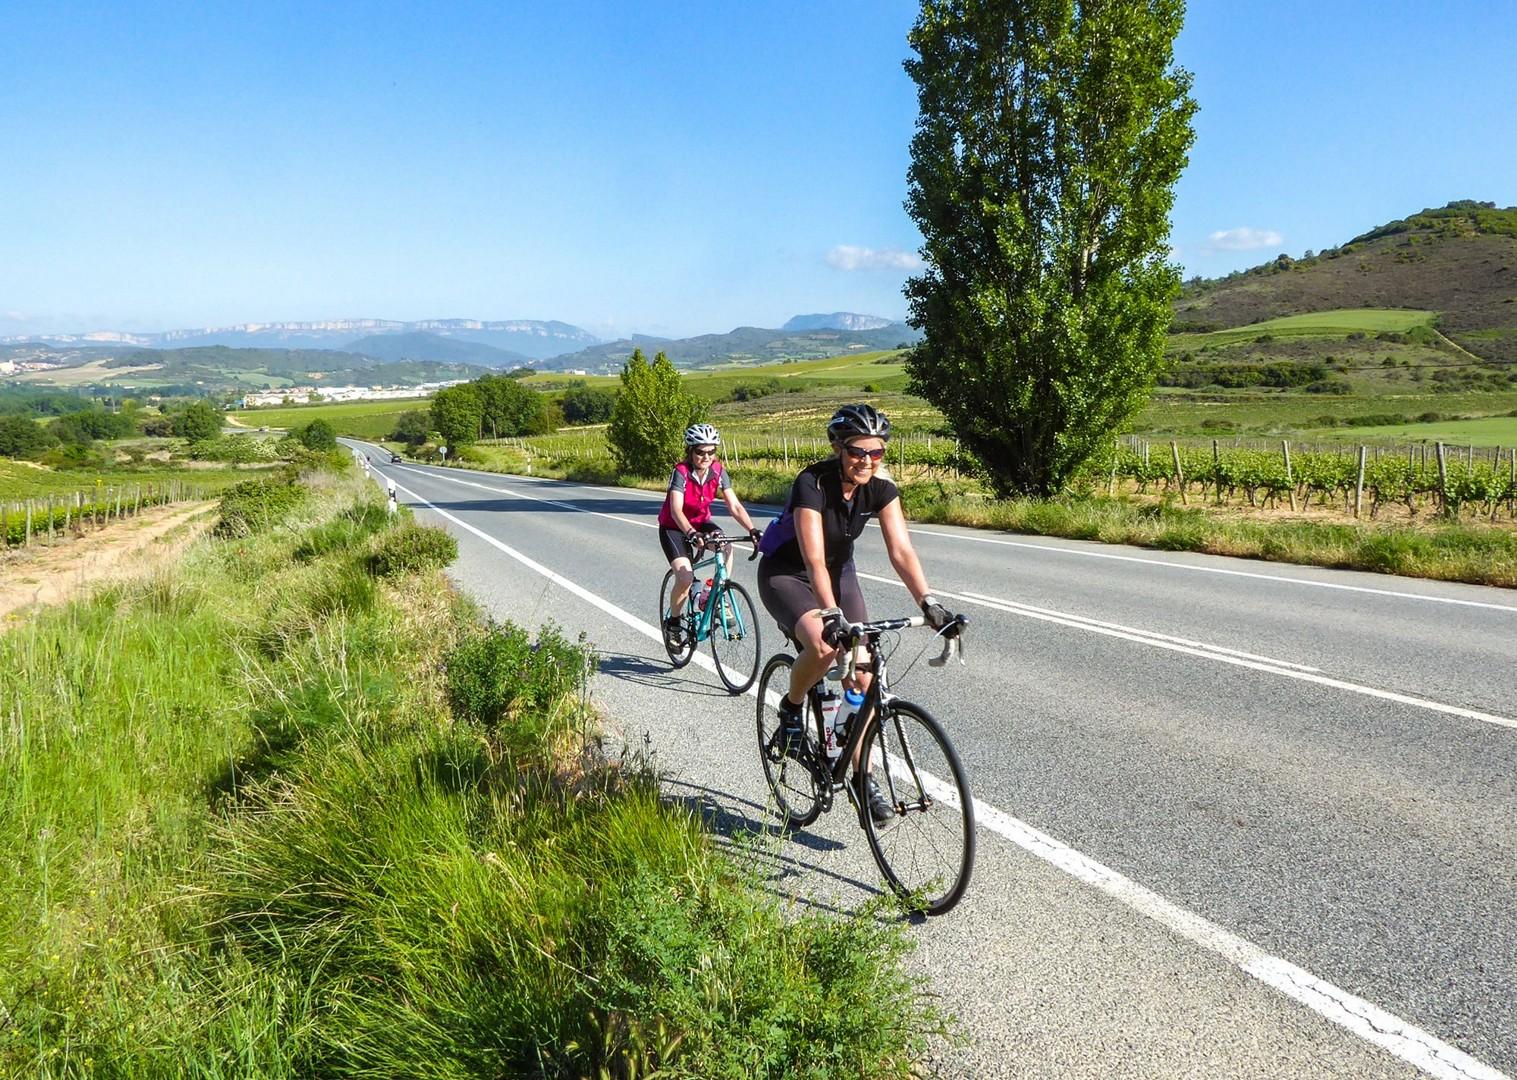 saddle-skedaddle-bilbao-to-barcelona-northern-spain-cycling-holiday.jpg - Northern Spain - Bilbao to Barcelona - Guided Road Cycling Holiday - Road Cycling